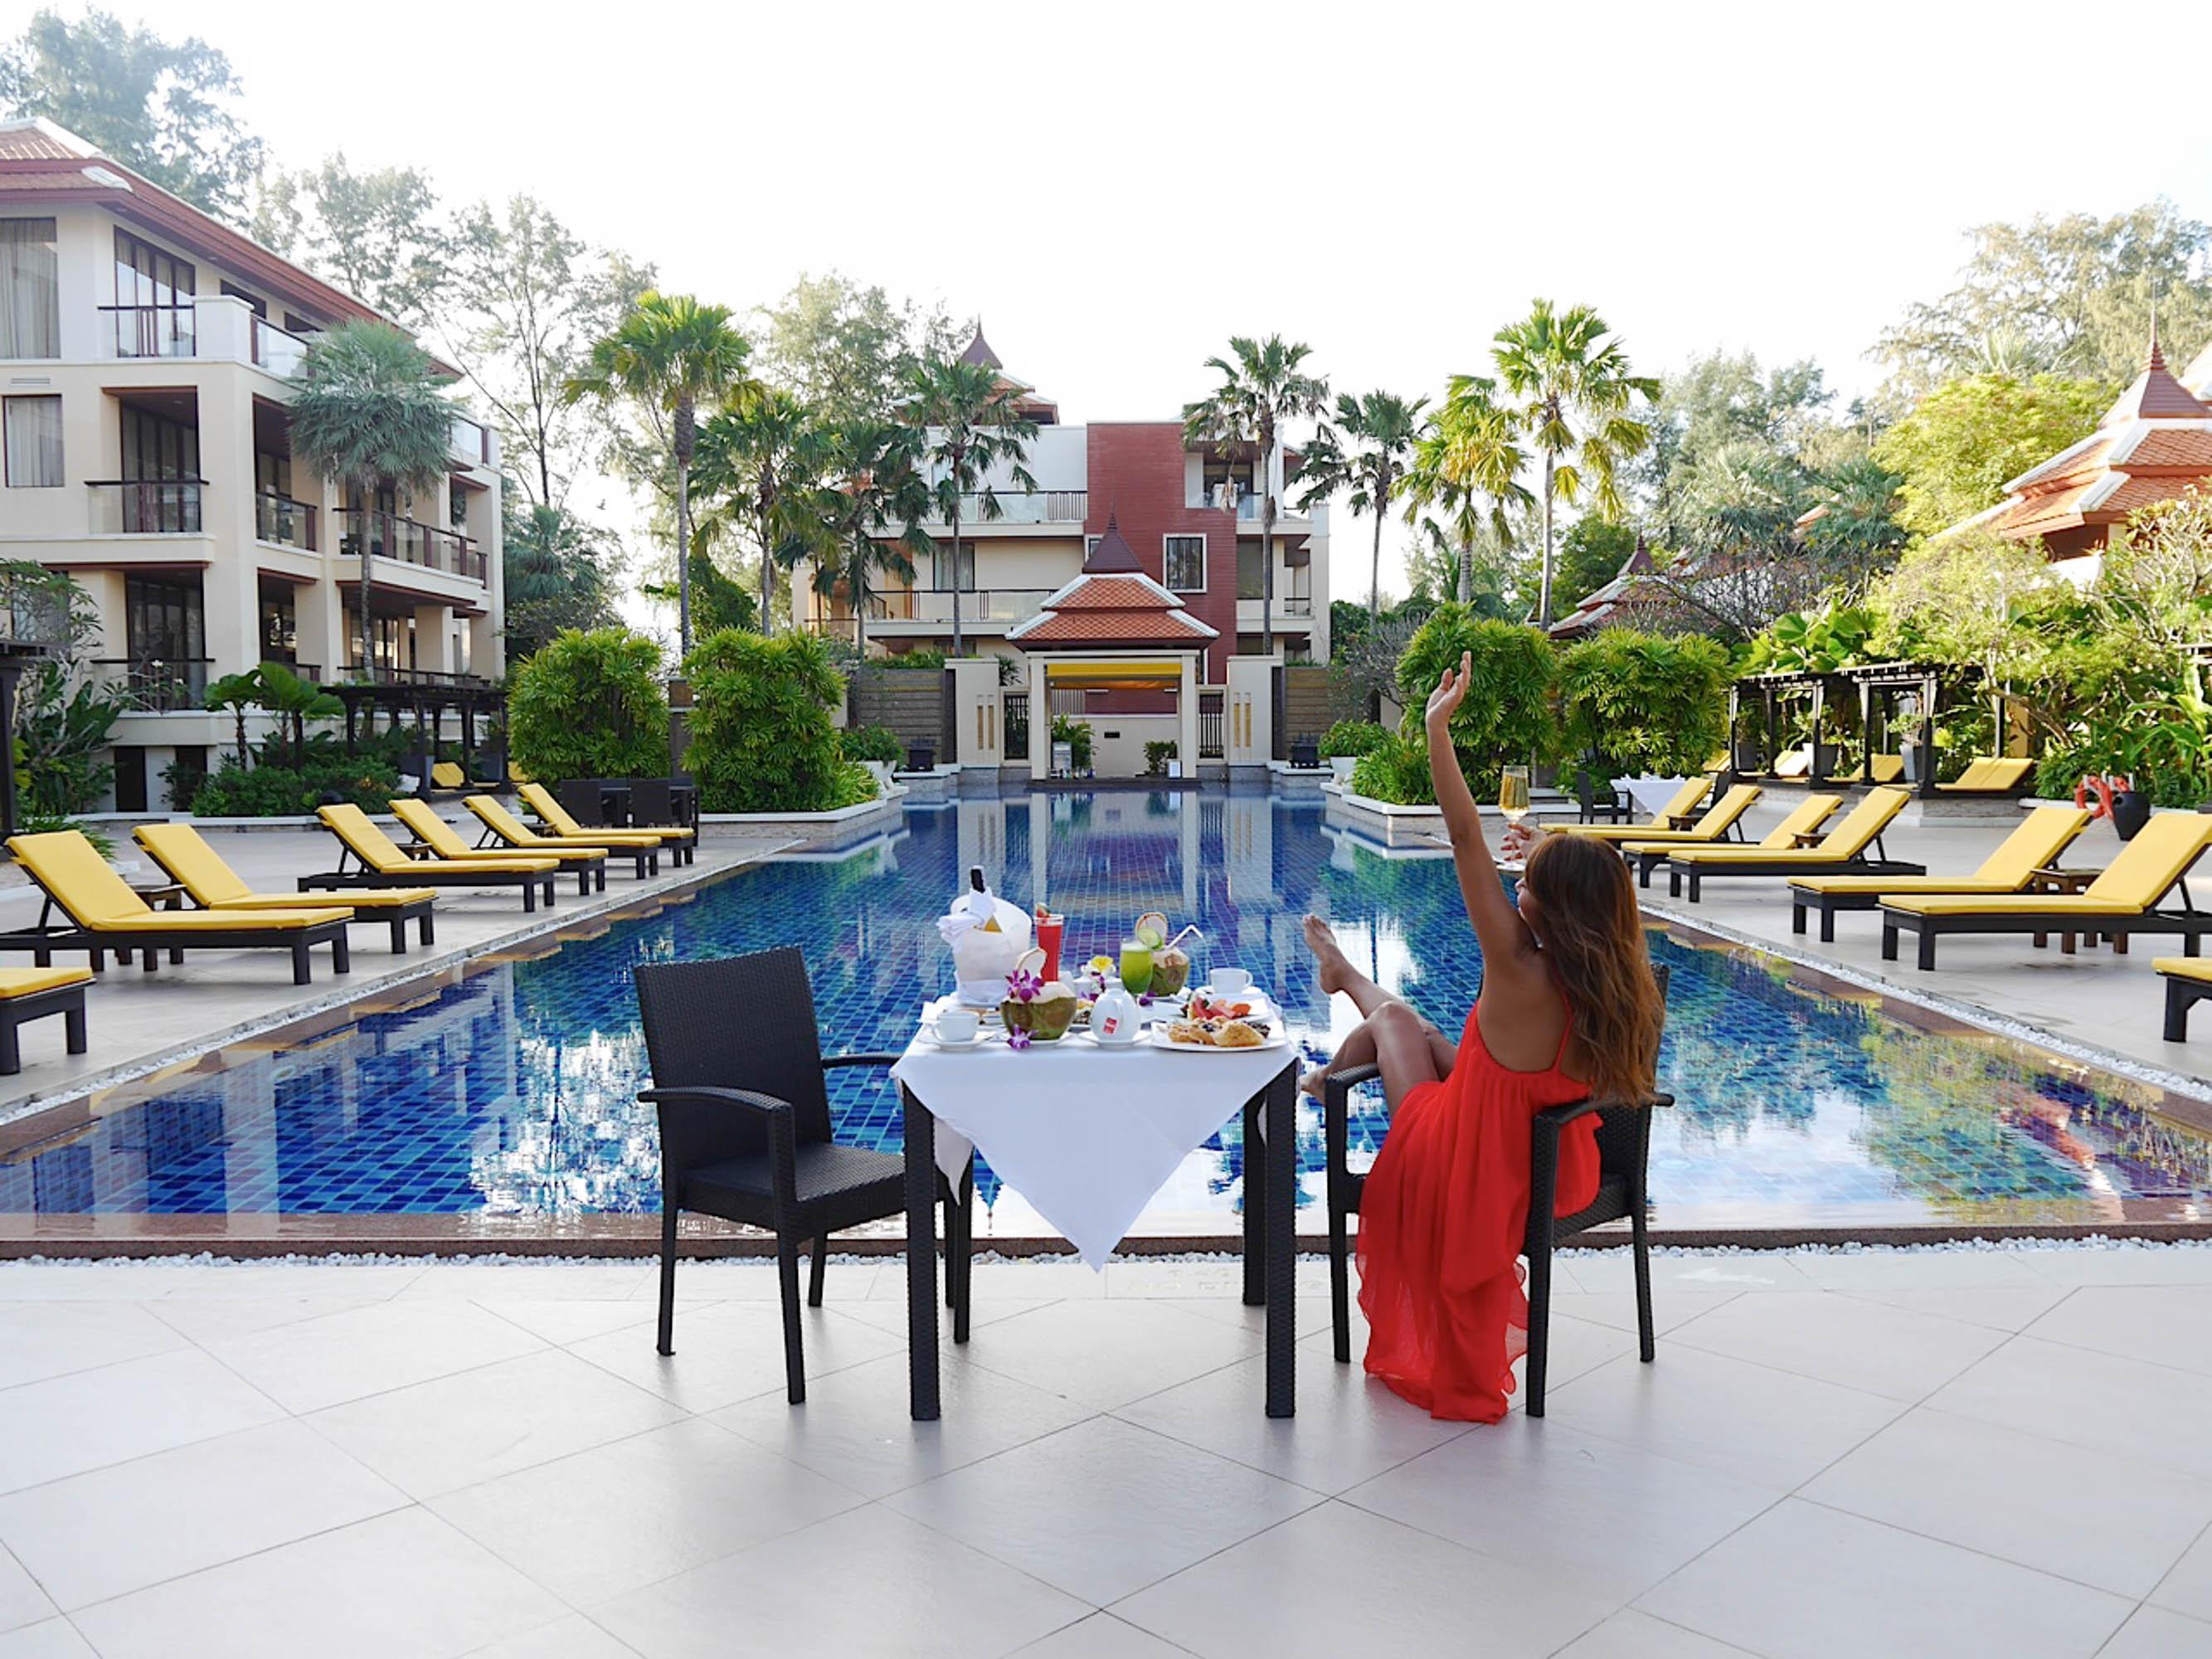 theclassycloud-hotel-review-movenpick-bangtao-phuket (5 von 8)